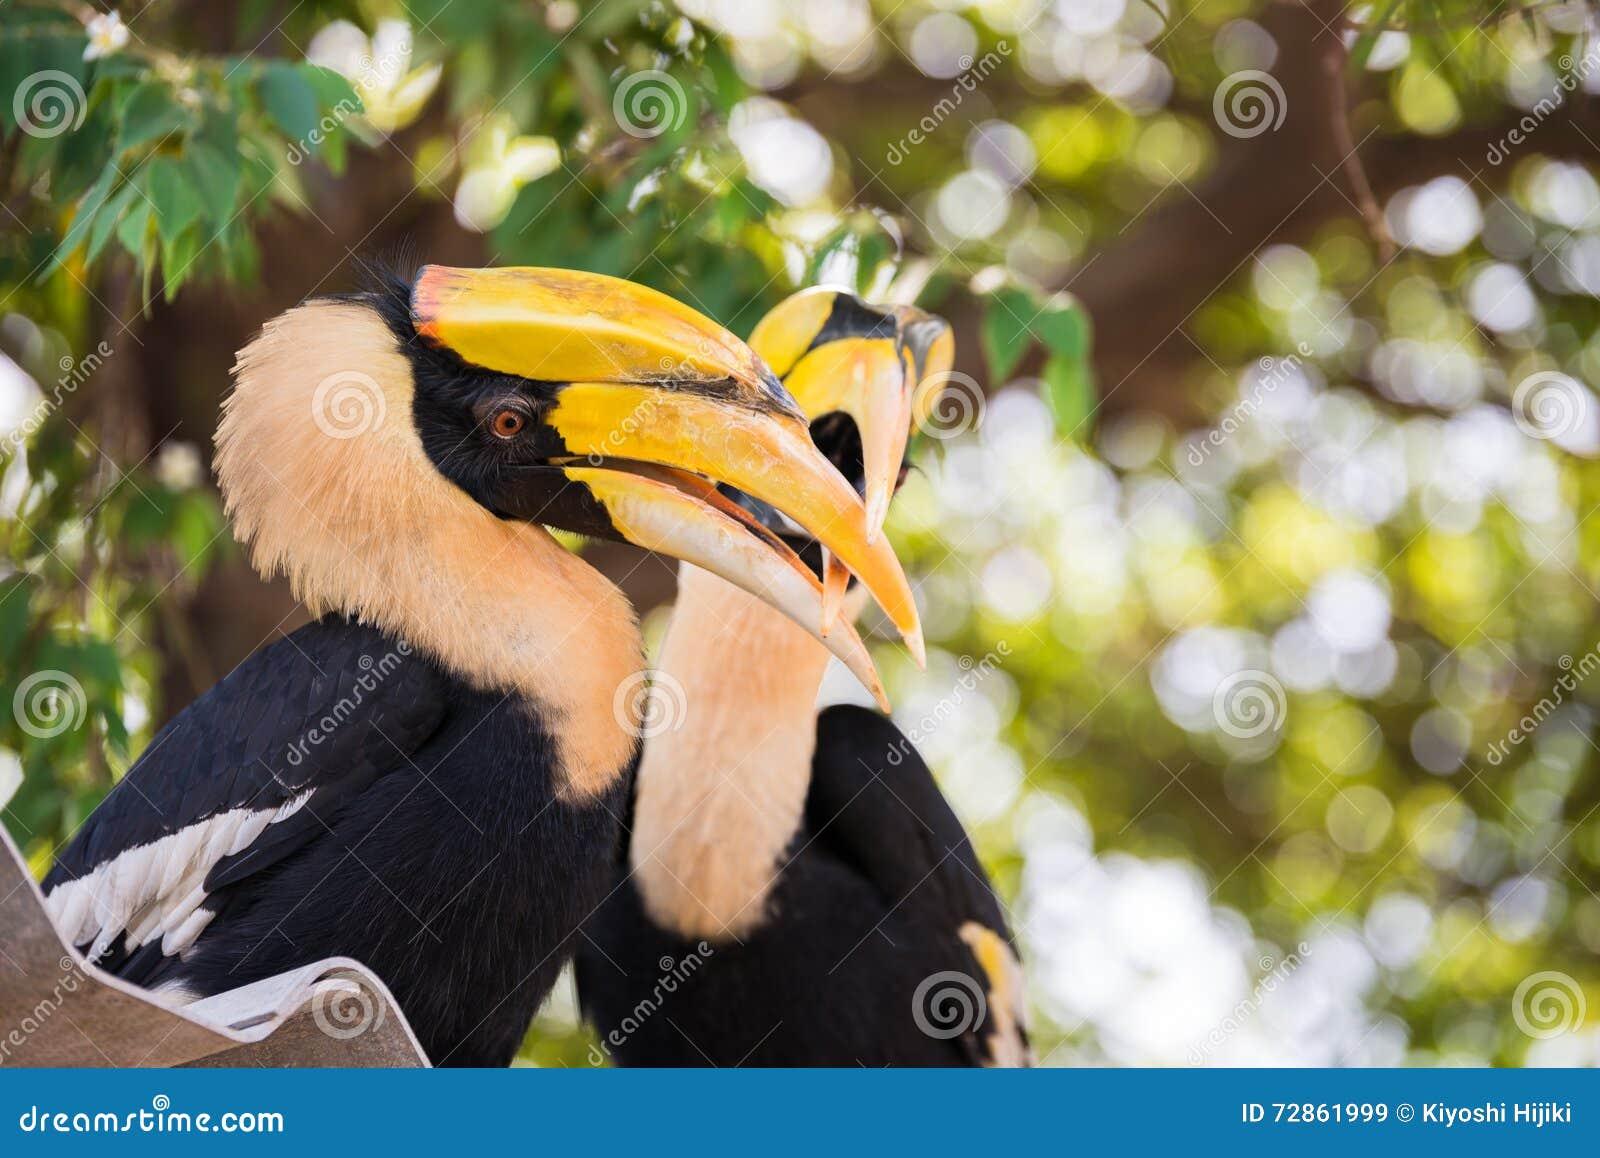 Great indian hornbill in love